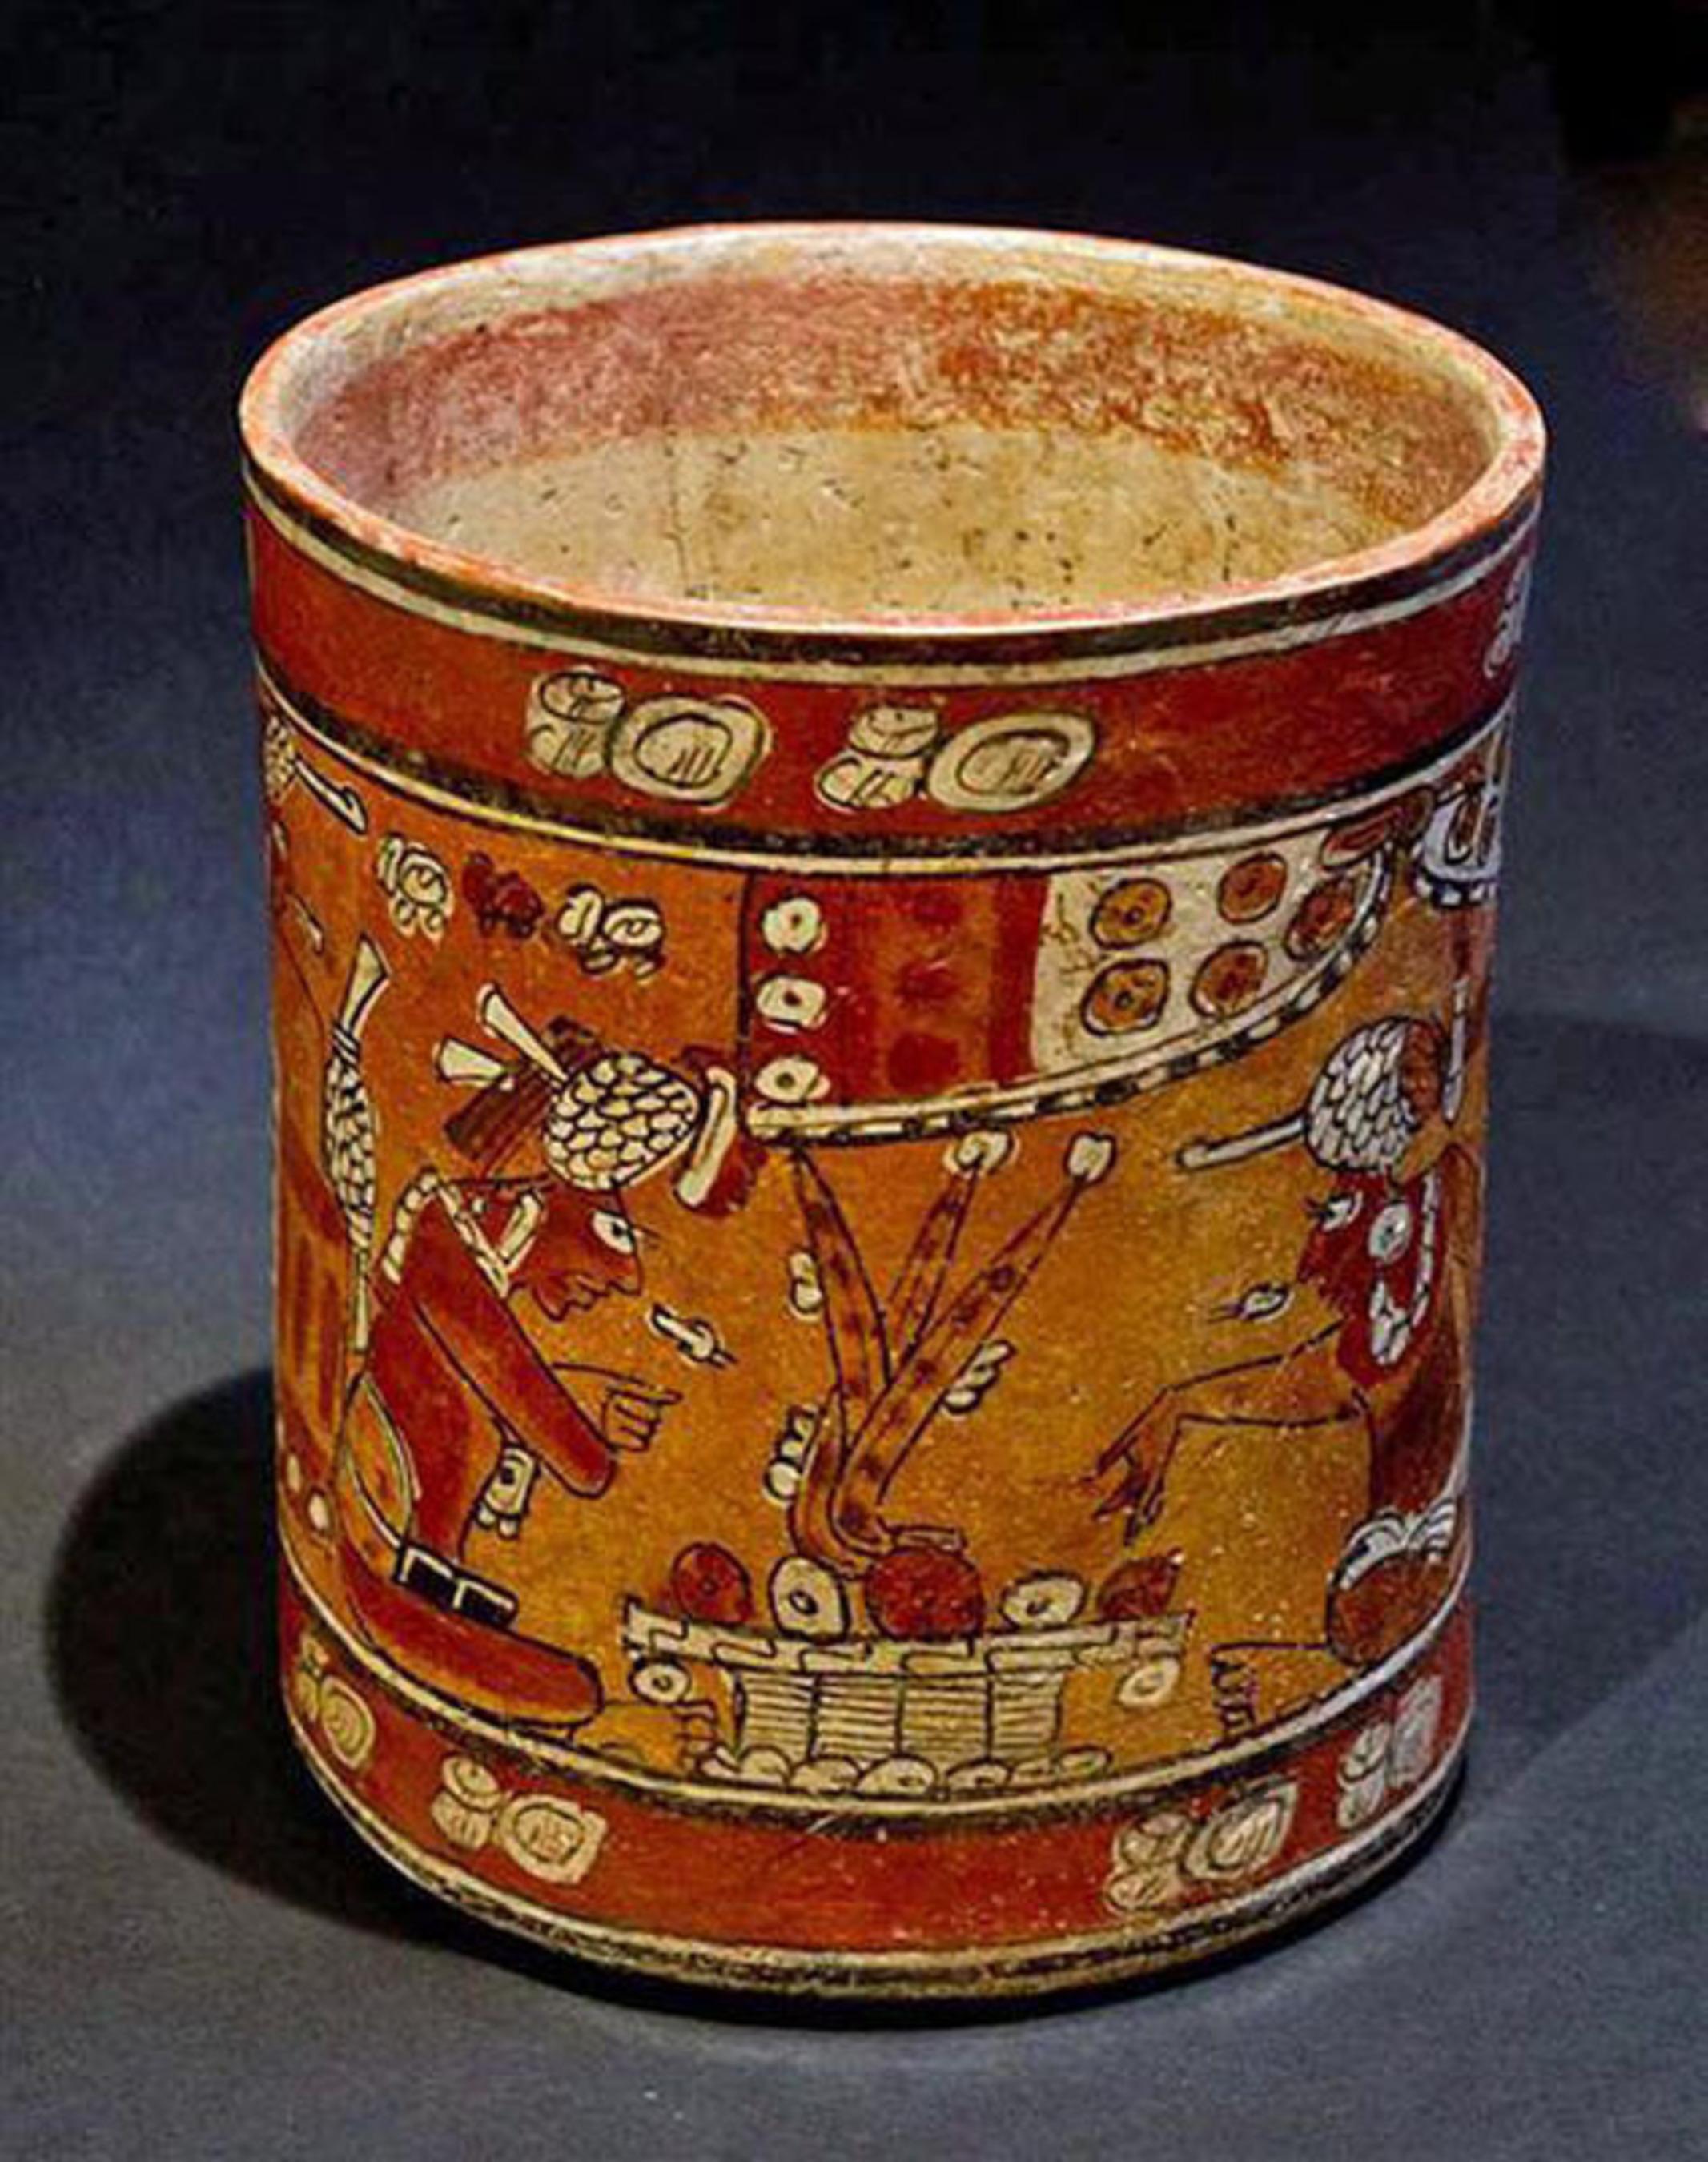 A Mayan Polychrome Cylinder - Kerr Rollout 8277, Mexico, Ca.600 - 900 AD. Estimate $15,000 -$20,000.  (PRNewsFoto/Antiquities-Saleroom)